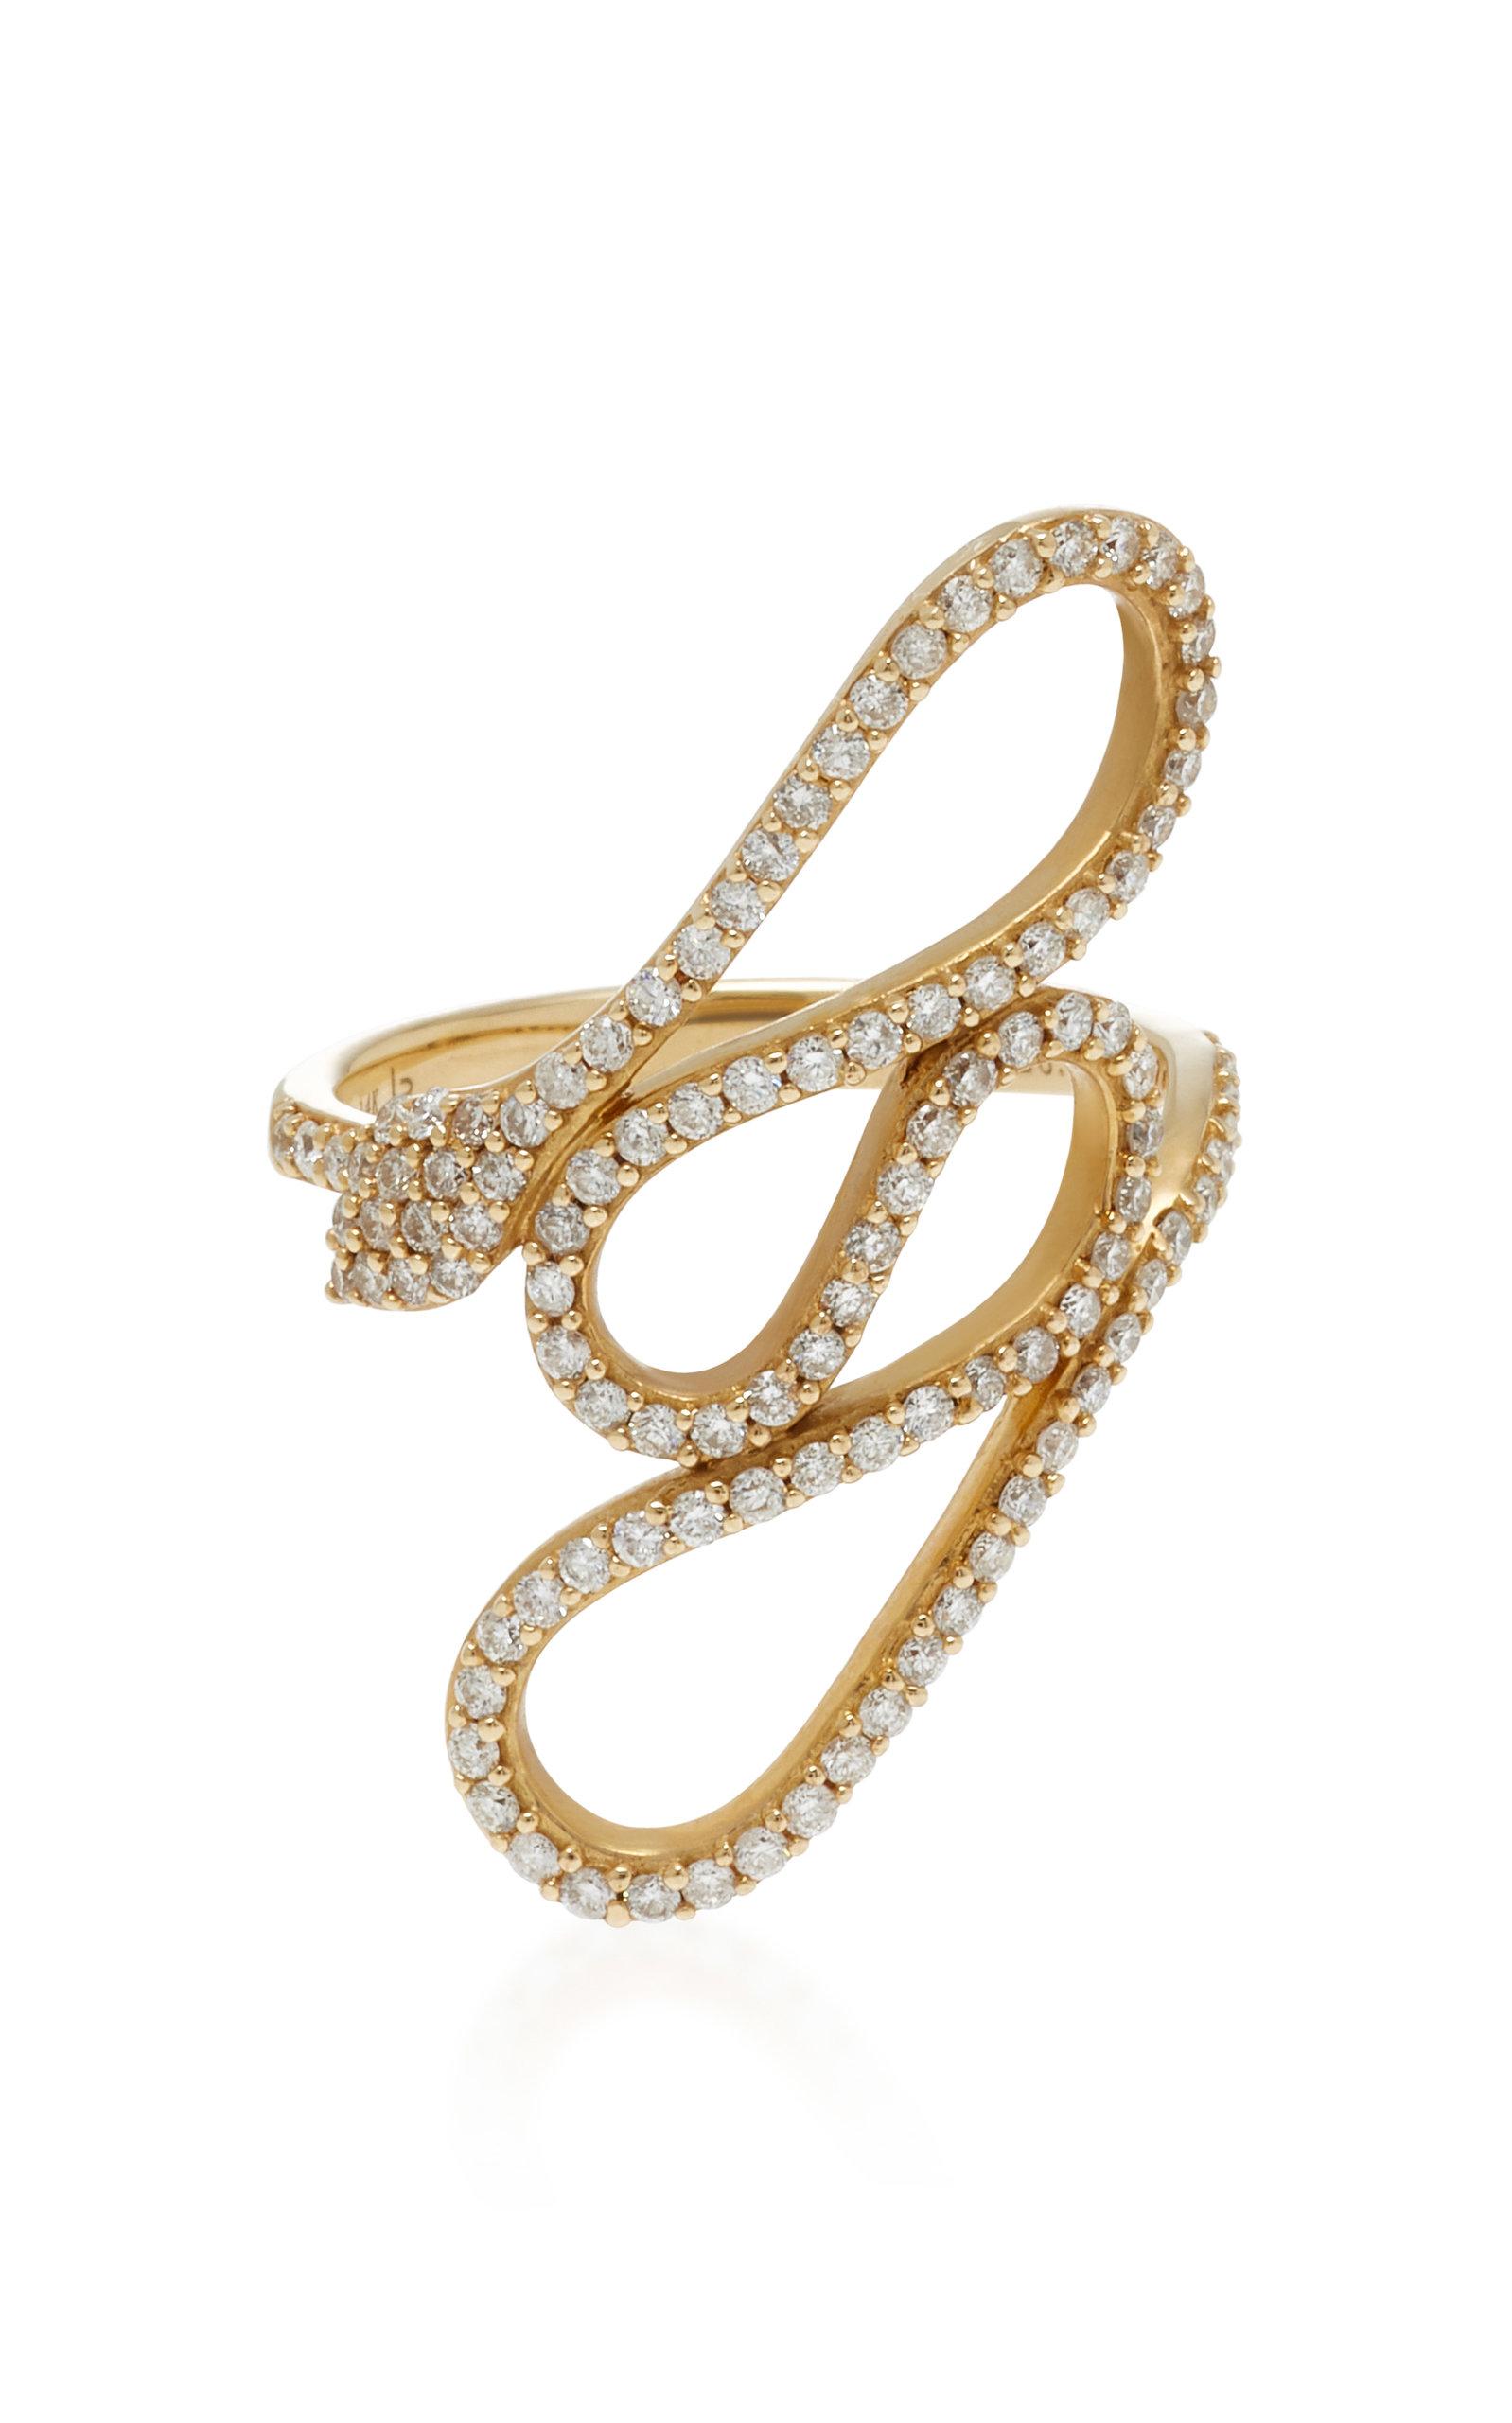 LYNN BAN JEWELRY SERPENT COIL 14K GOLD DIAMOND RING